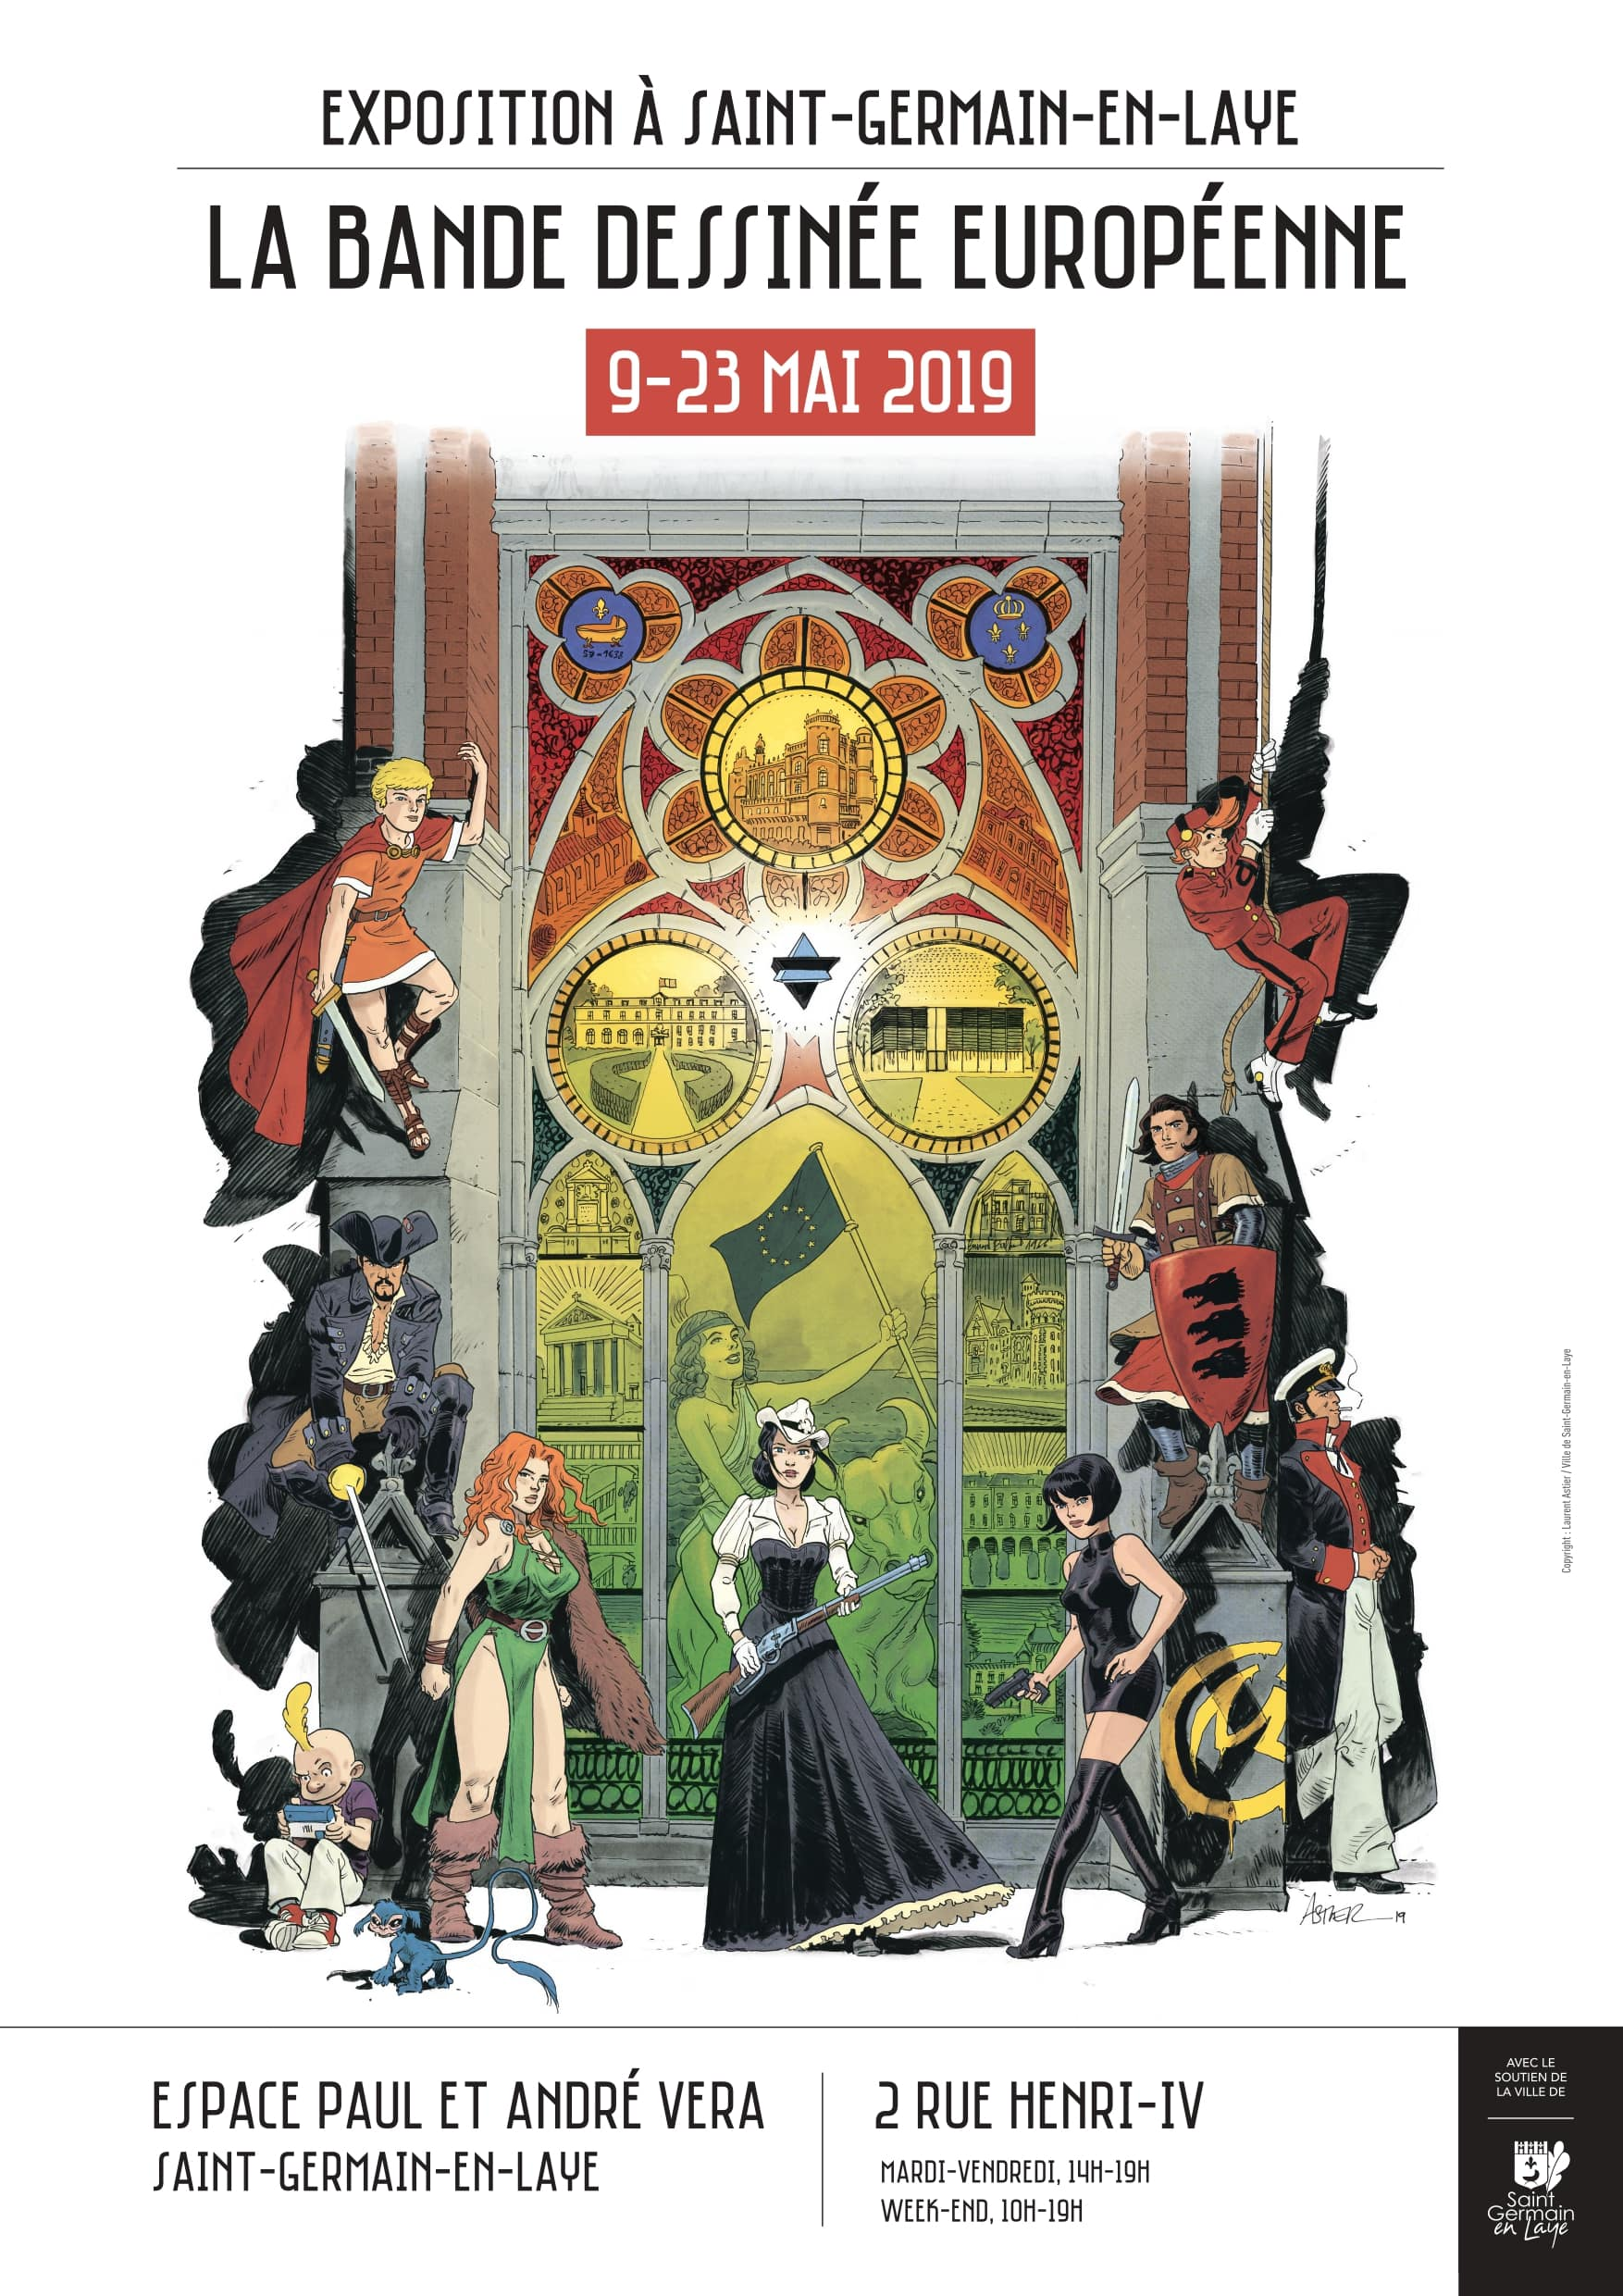 La Bande dessinée européenne